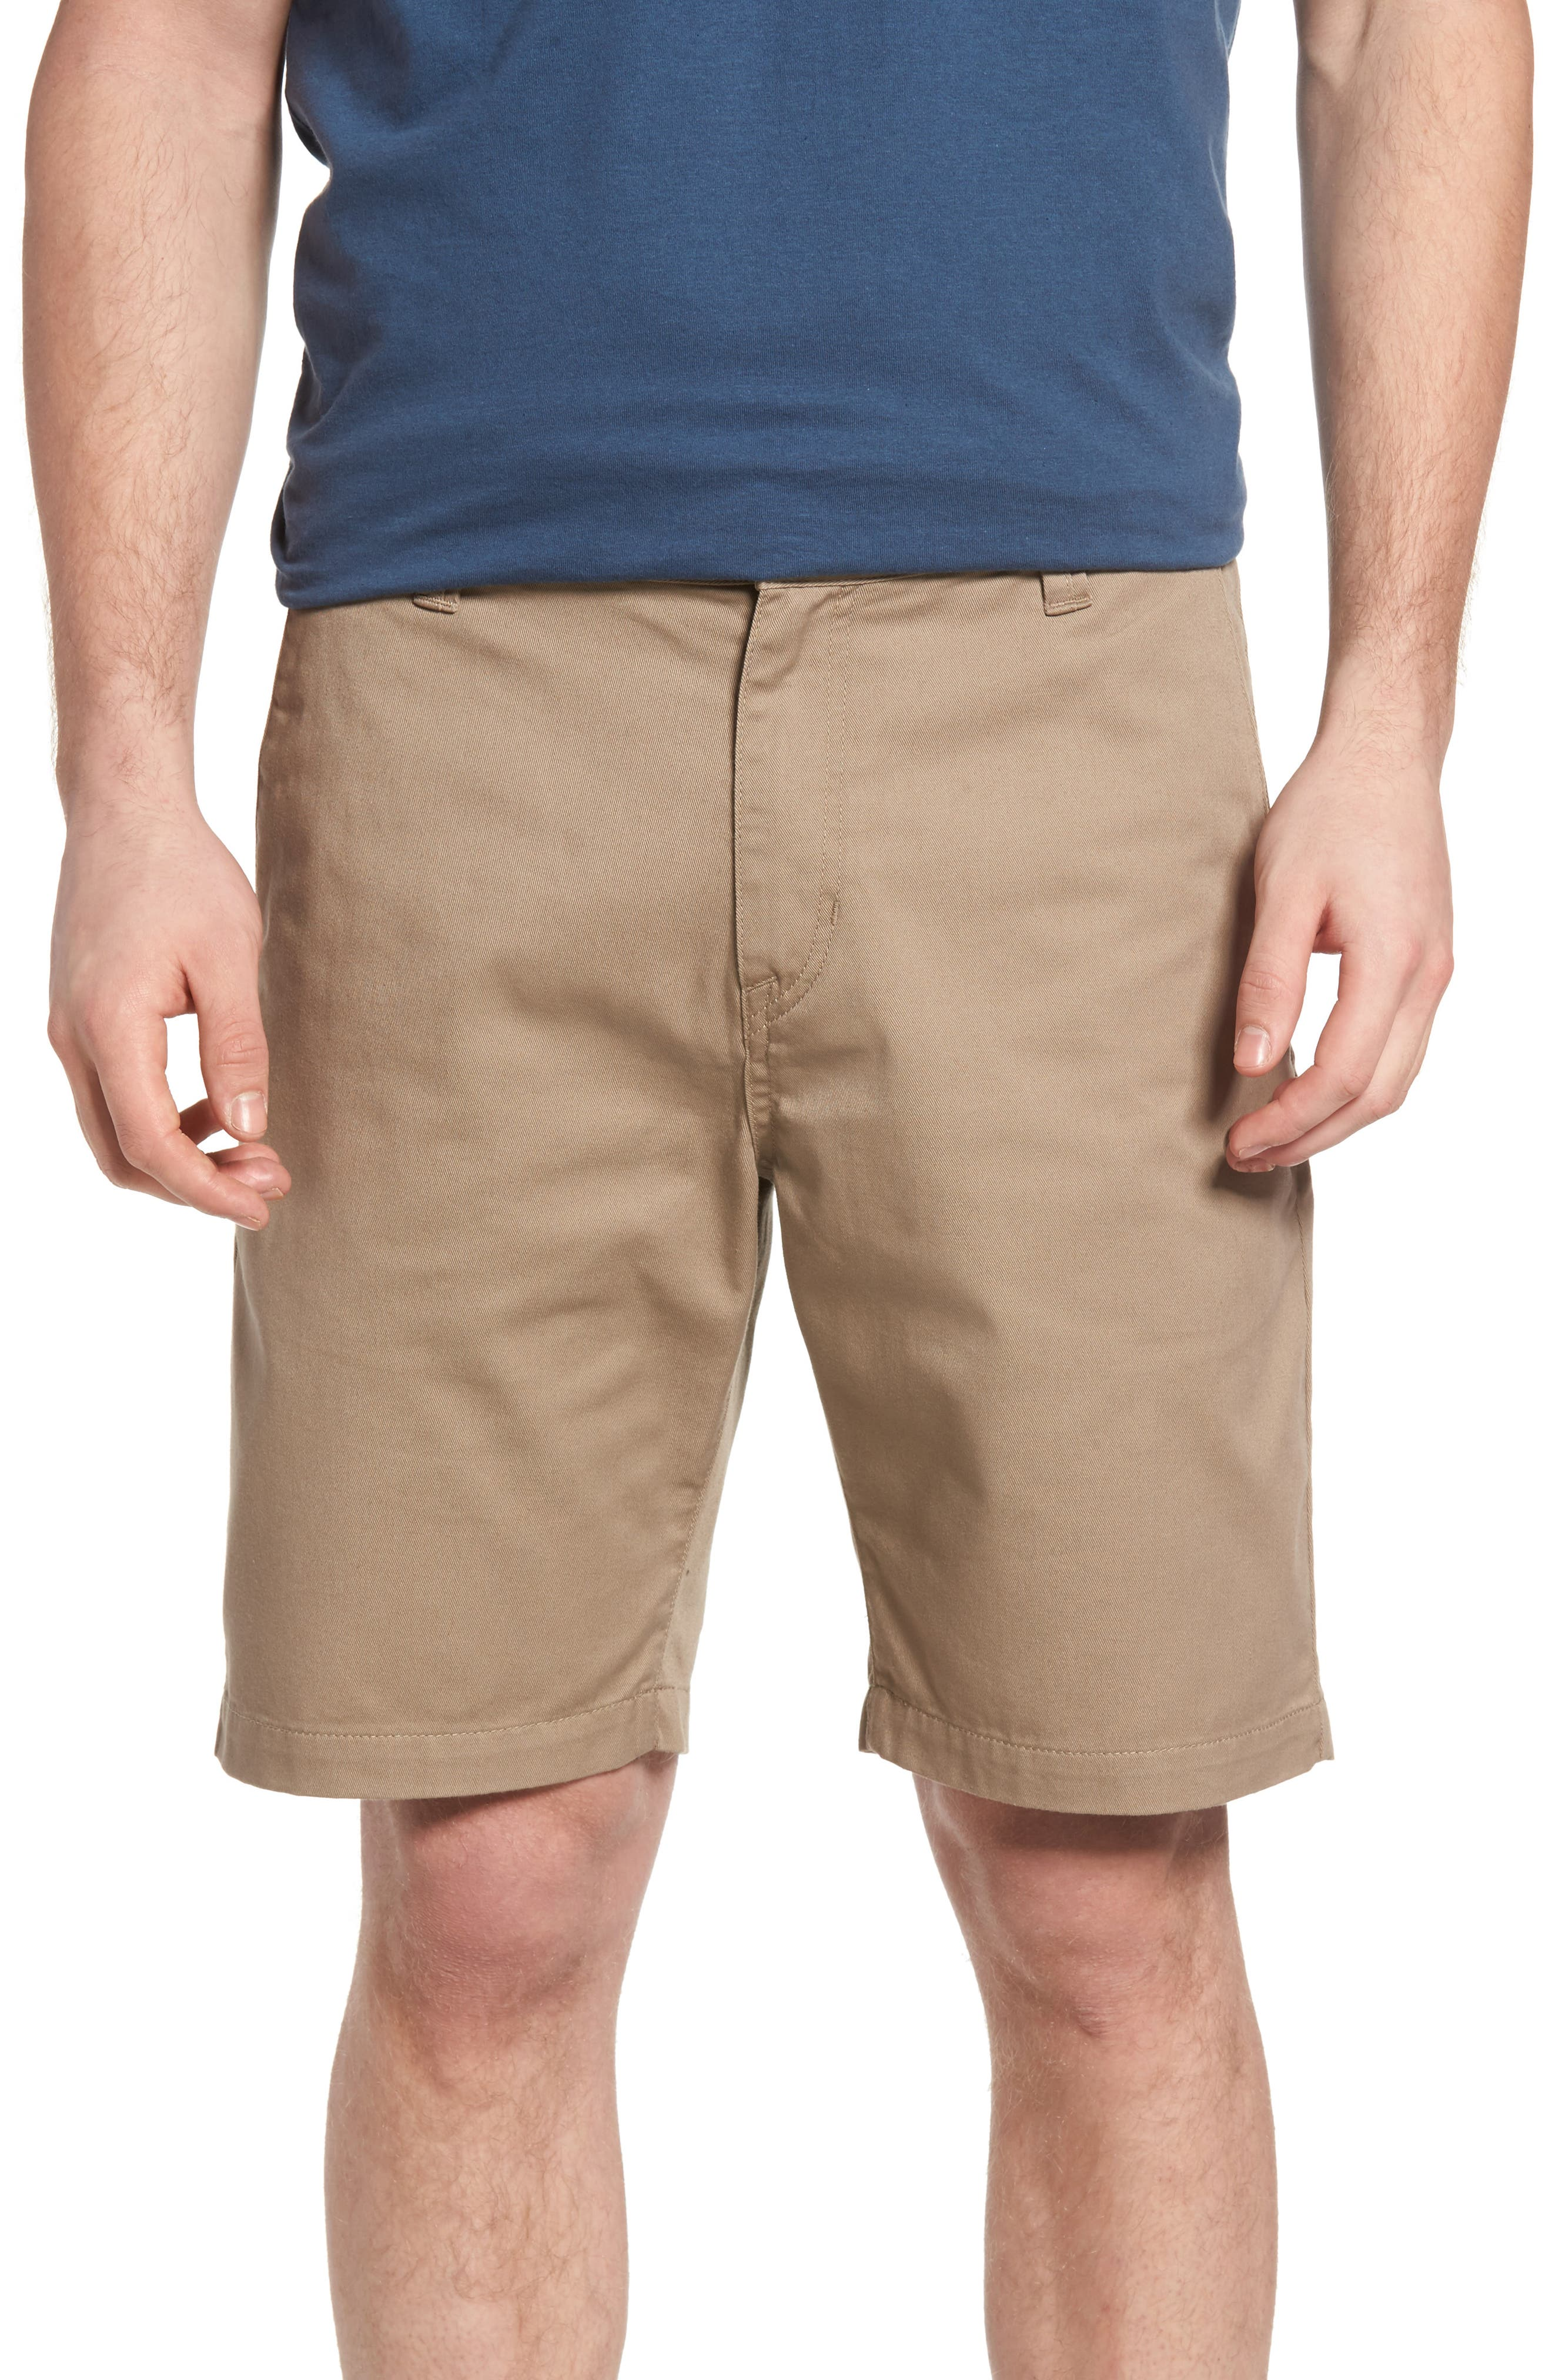 Alternate Image 1 Selected - Volcom Drifter Modern Chino Shorts